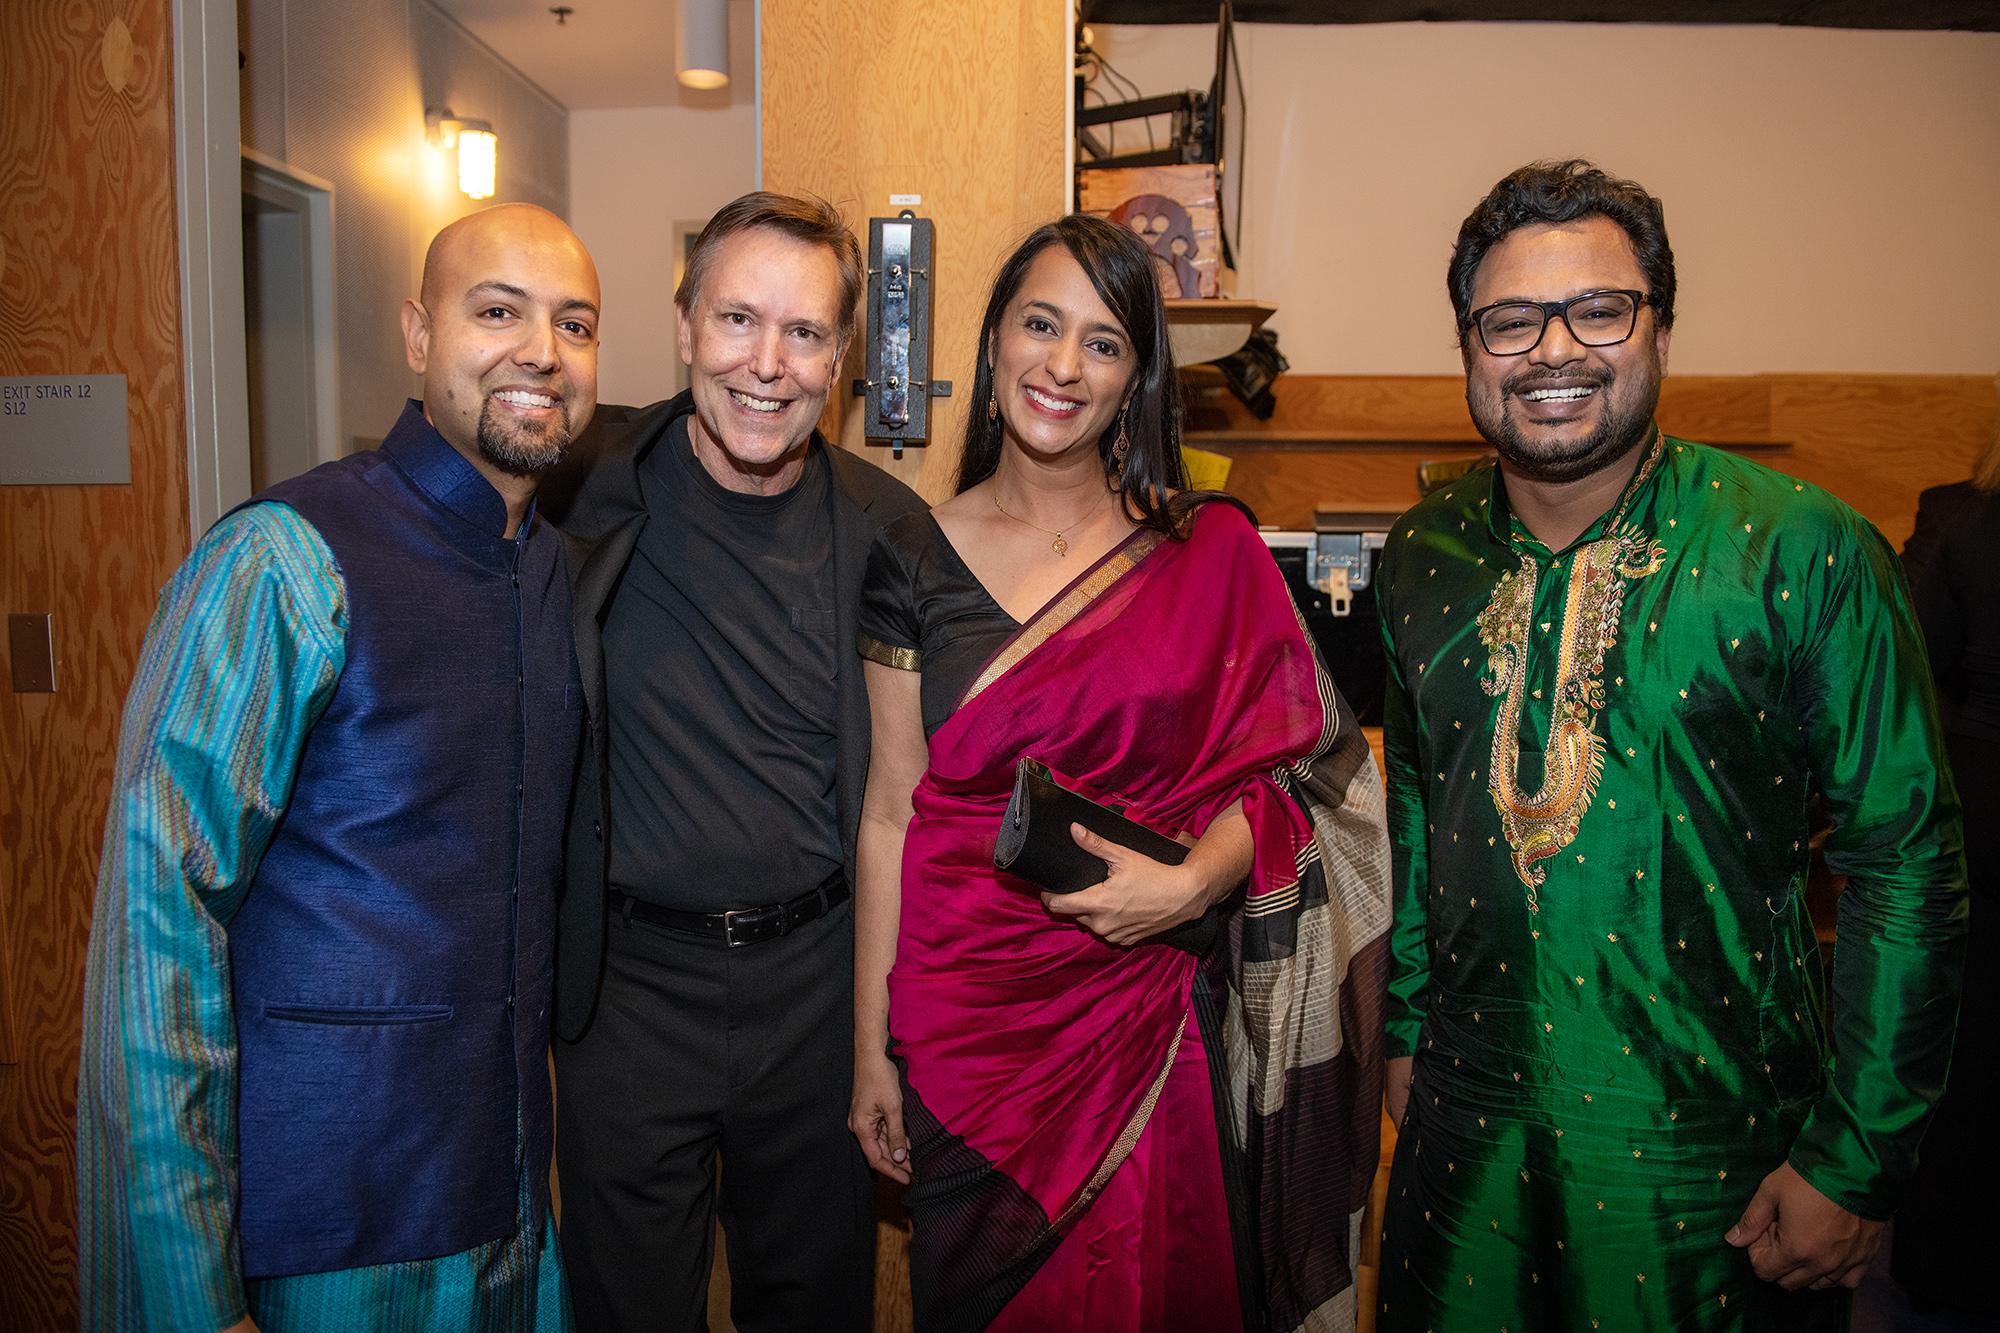 L-R: Robin Sukhadia (tabla), Grant Gershon (conductor), Reena Esmail (composer), and Rajib Karmakar (sitar) at Walt Disney Concert Hall November 18.